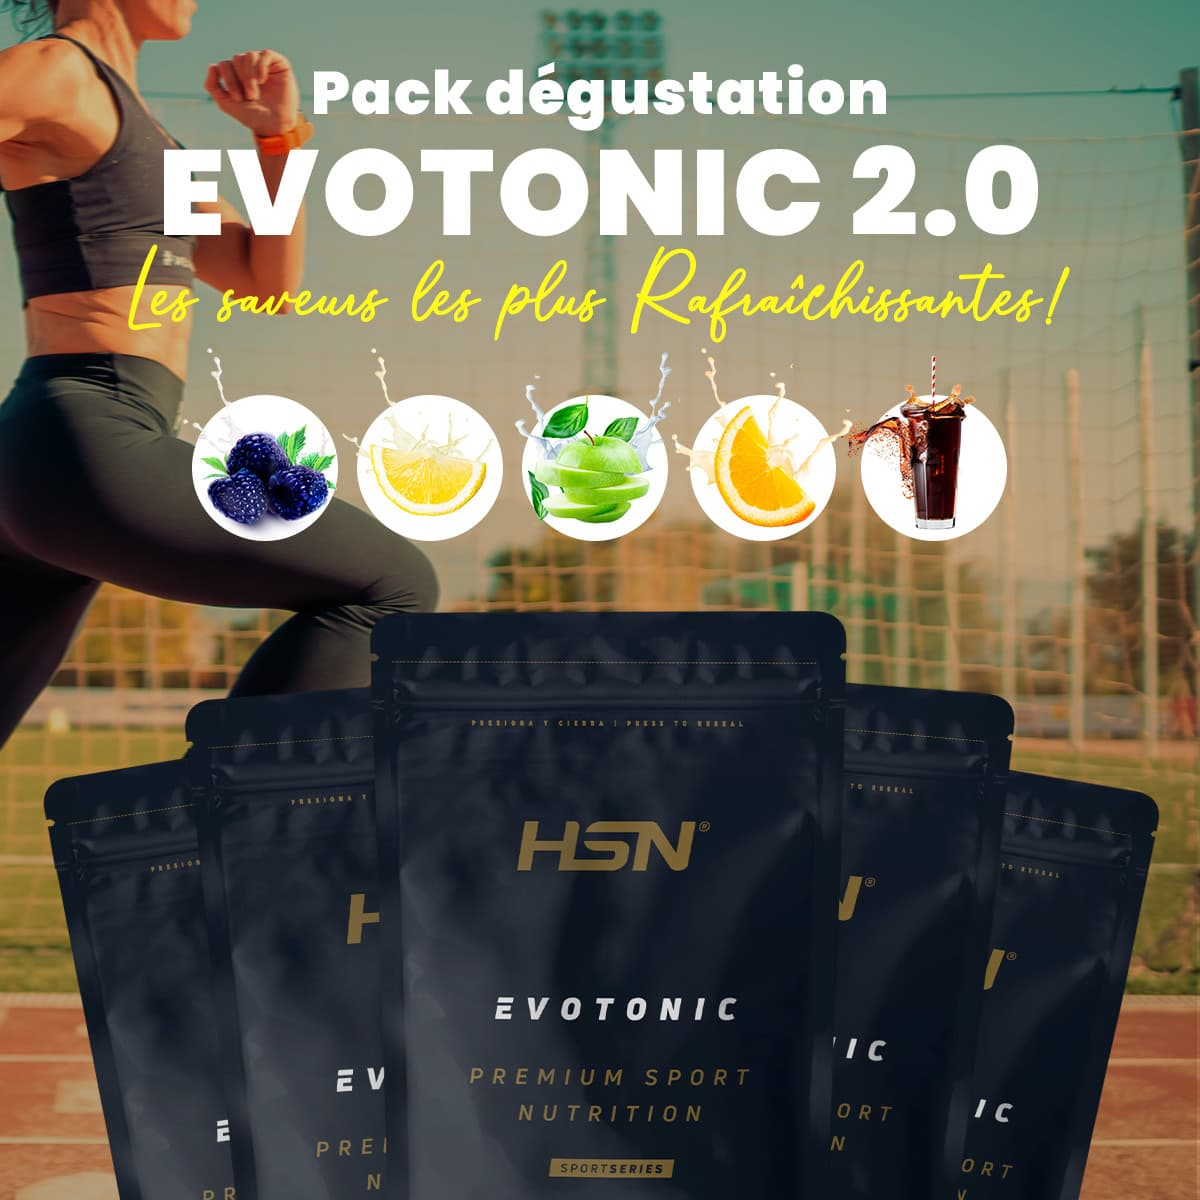 Evotonic 2.0 - Pack Dégustation